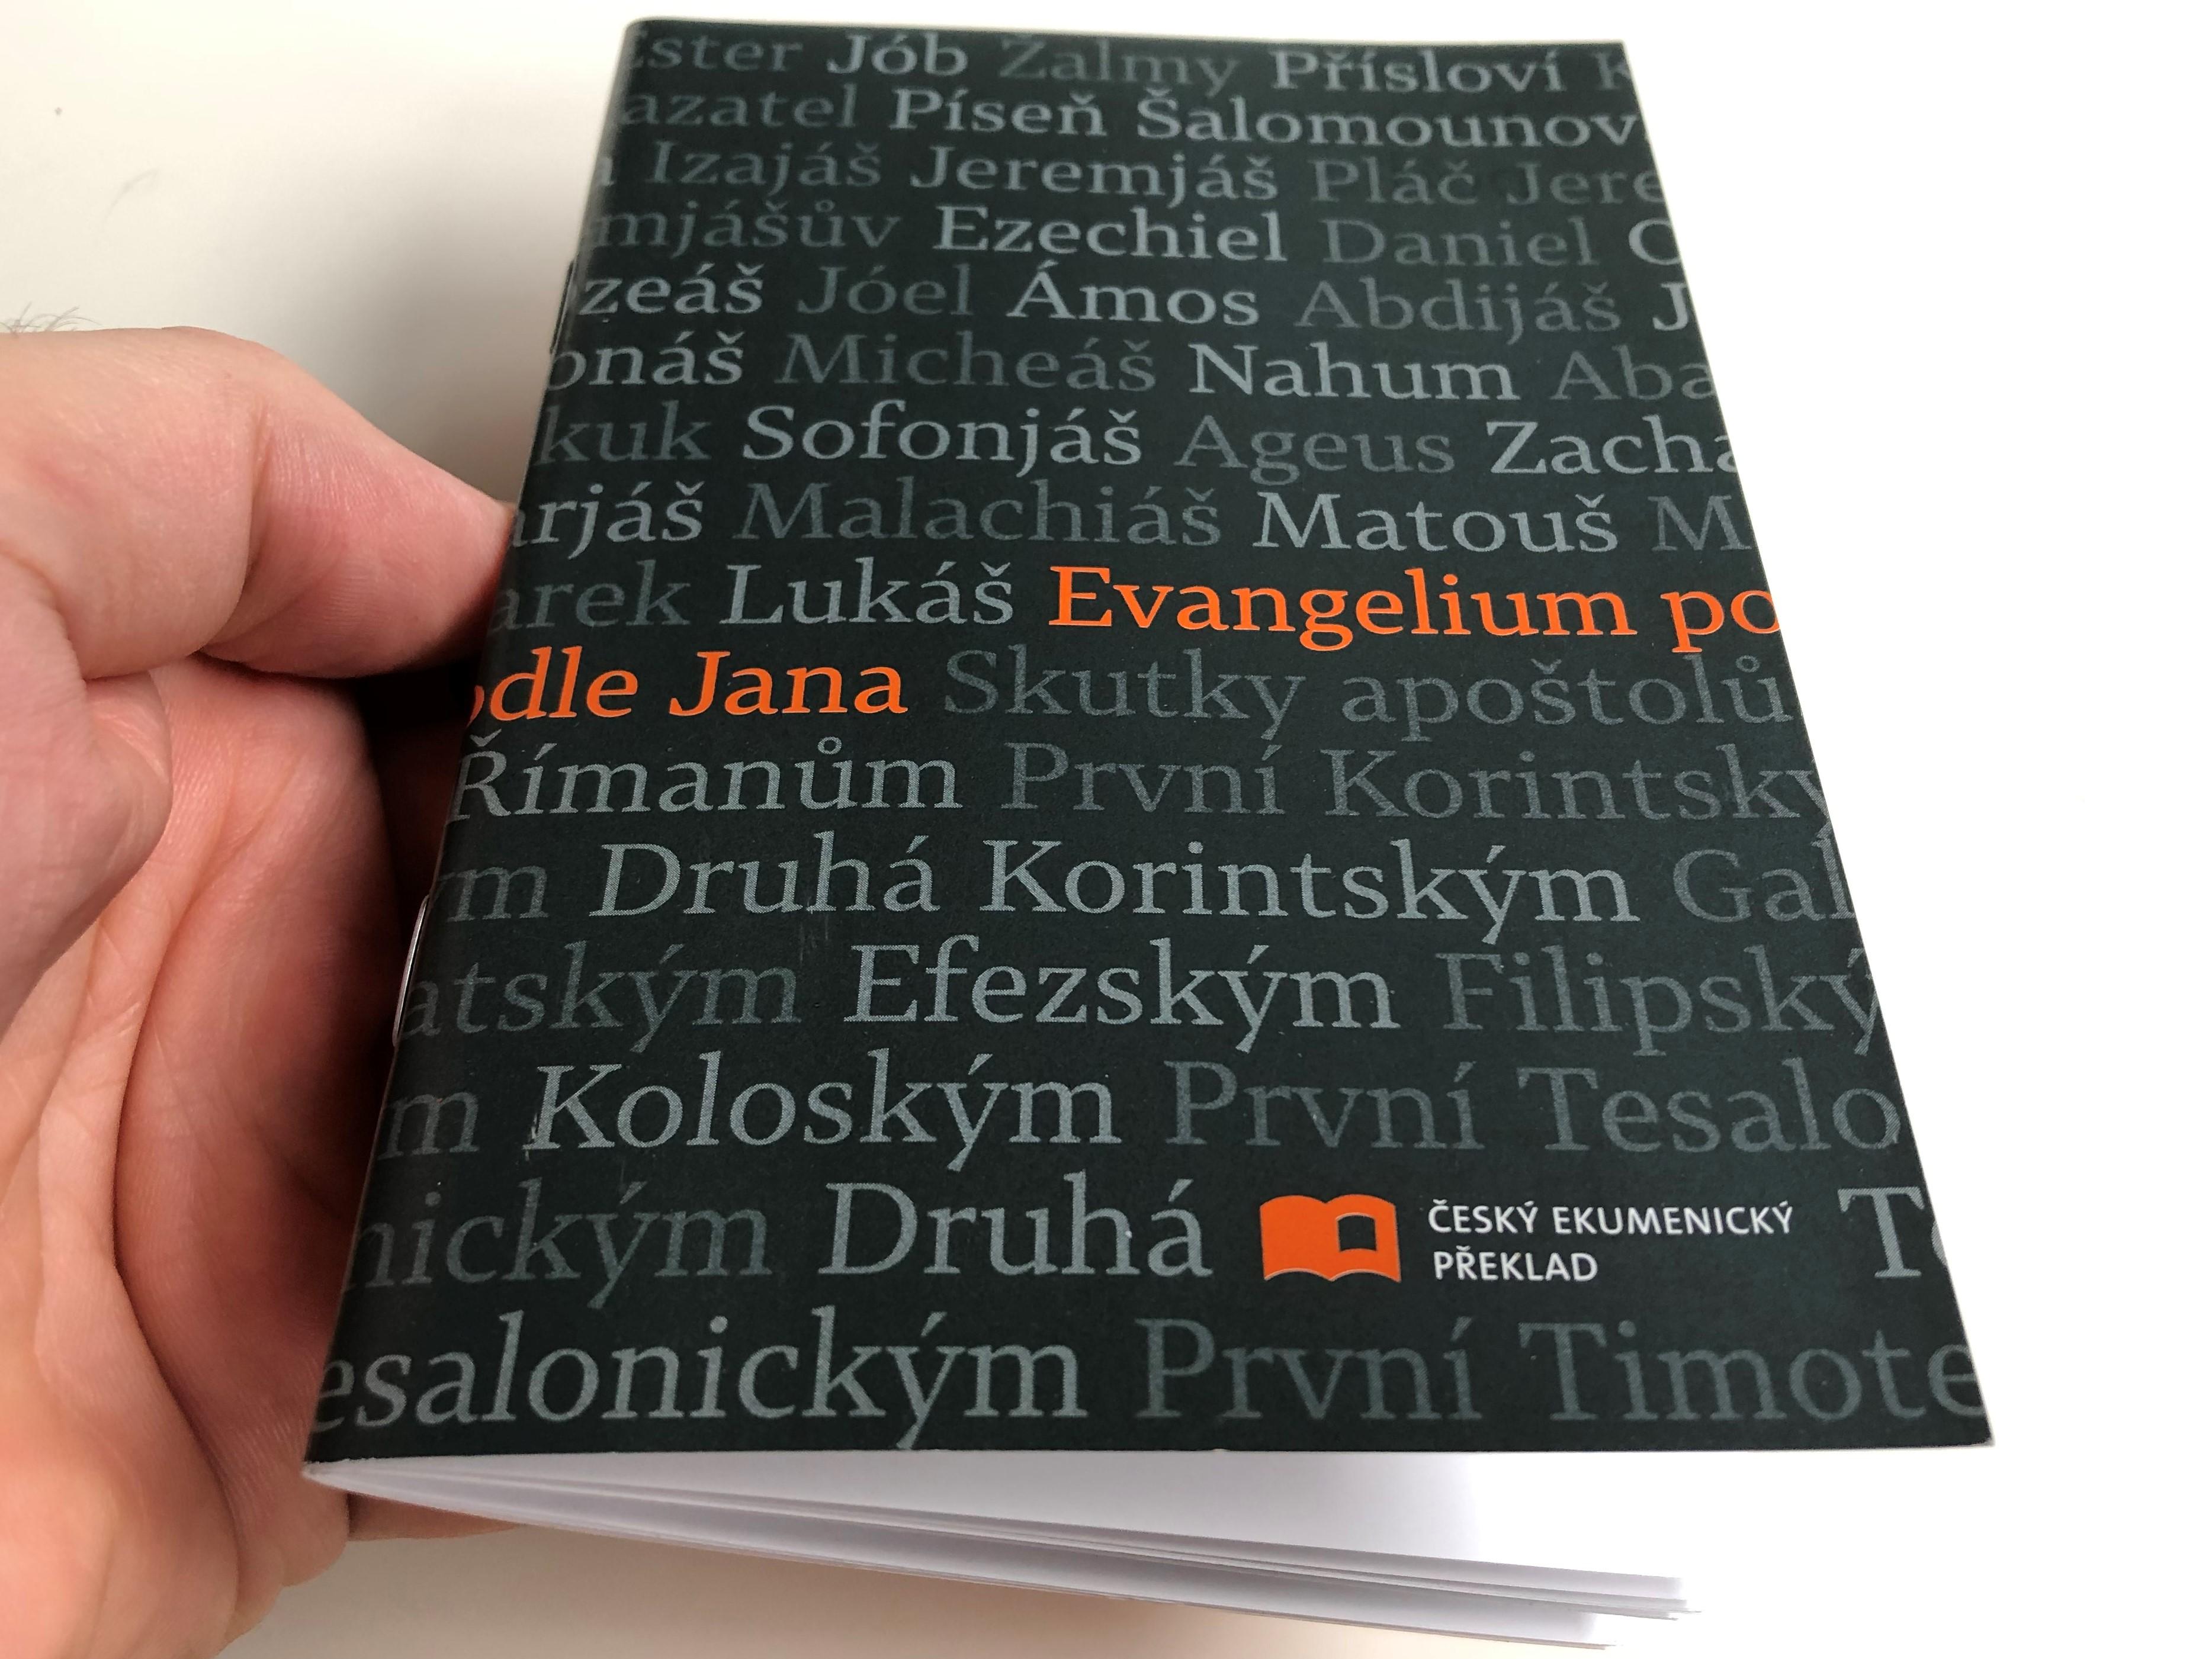 evangelium-podle-jana-czech-language-gospel-according-to-john-9.jpg